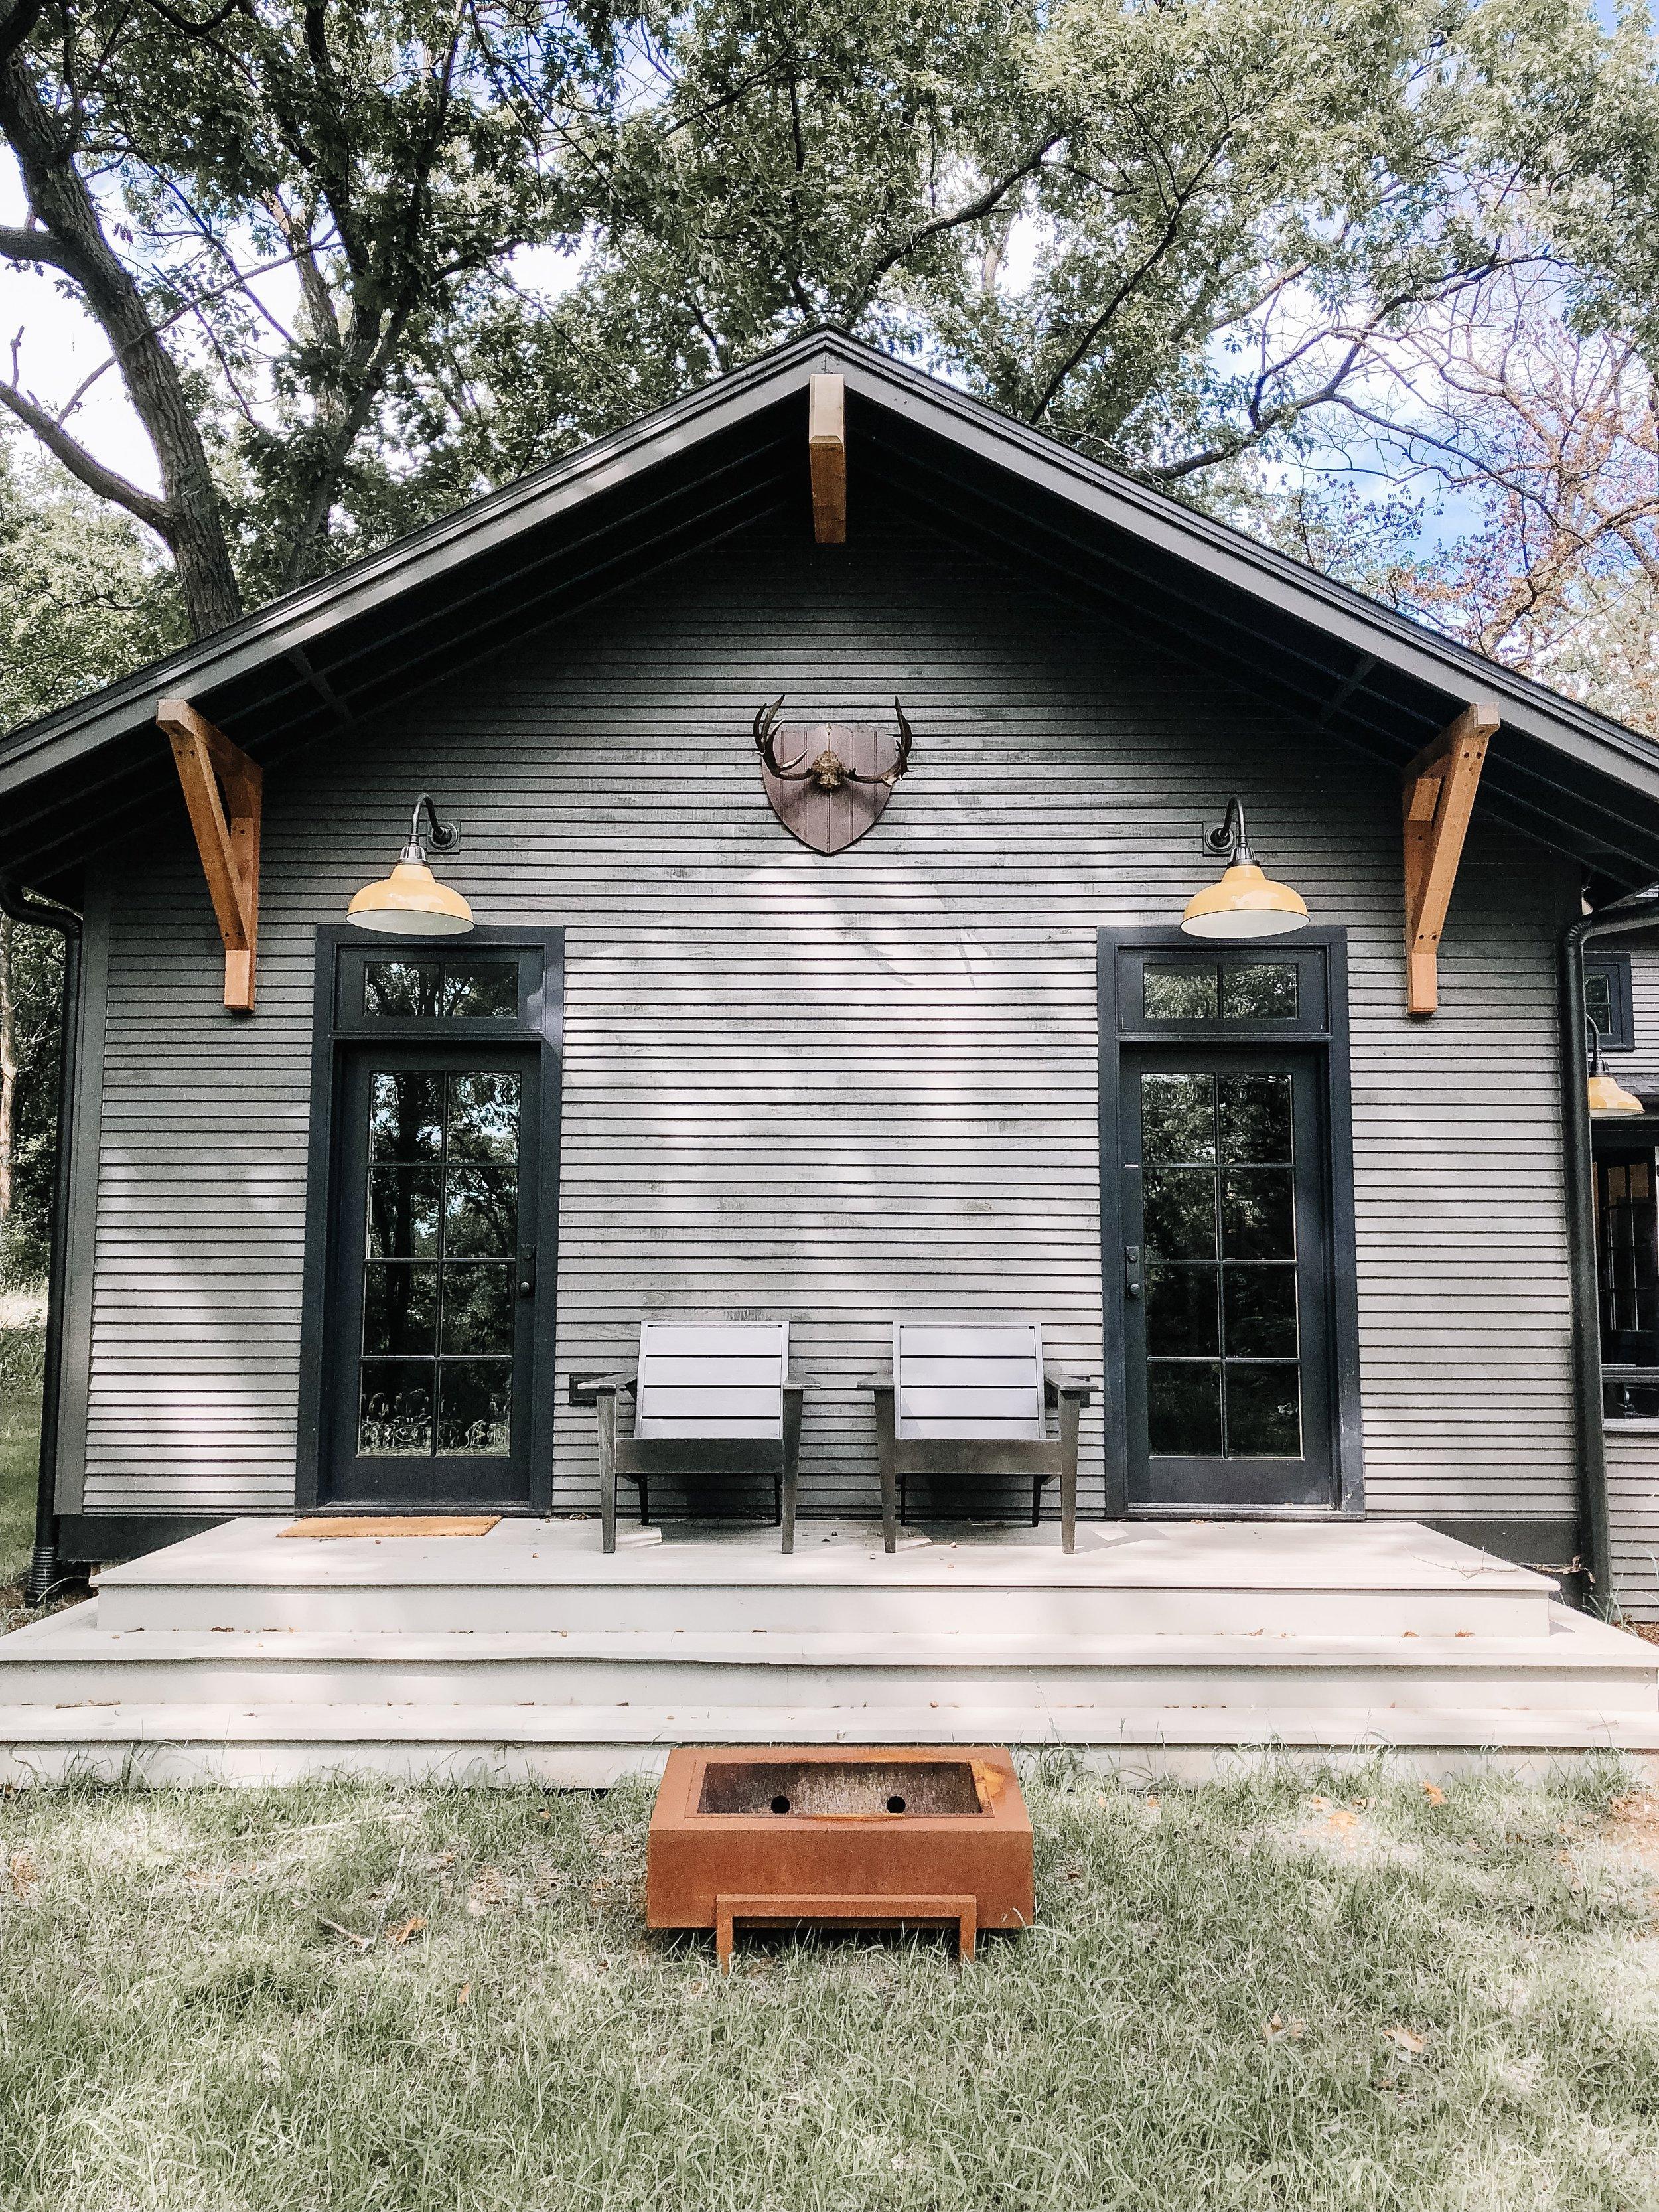 Camp Wandawega - Elkhorn, Wisconsin